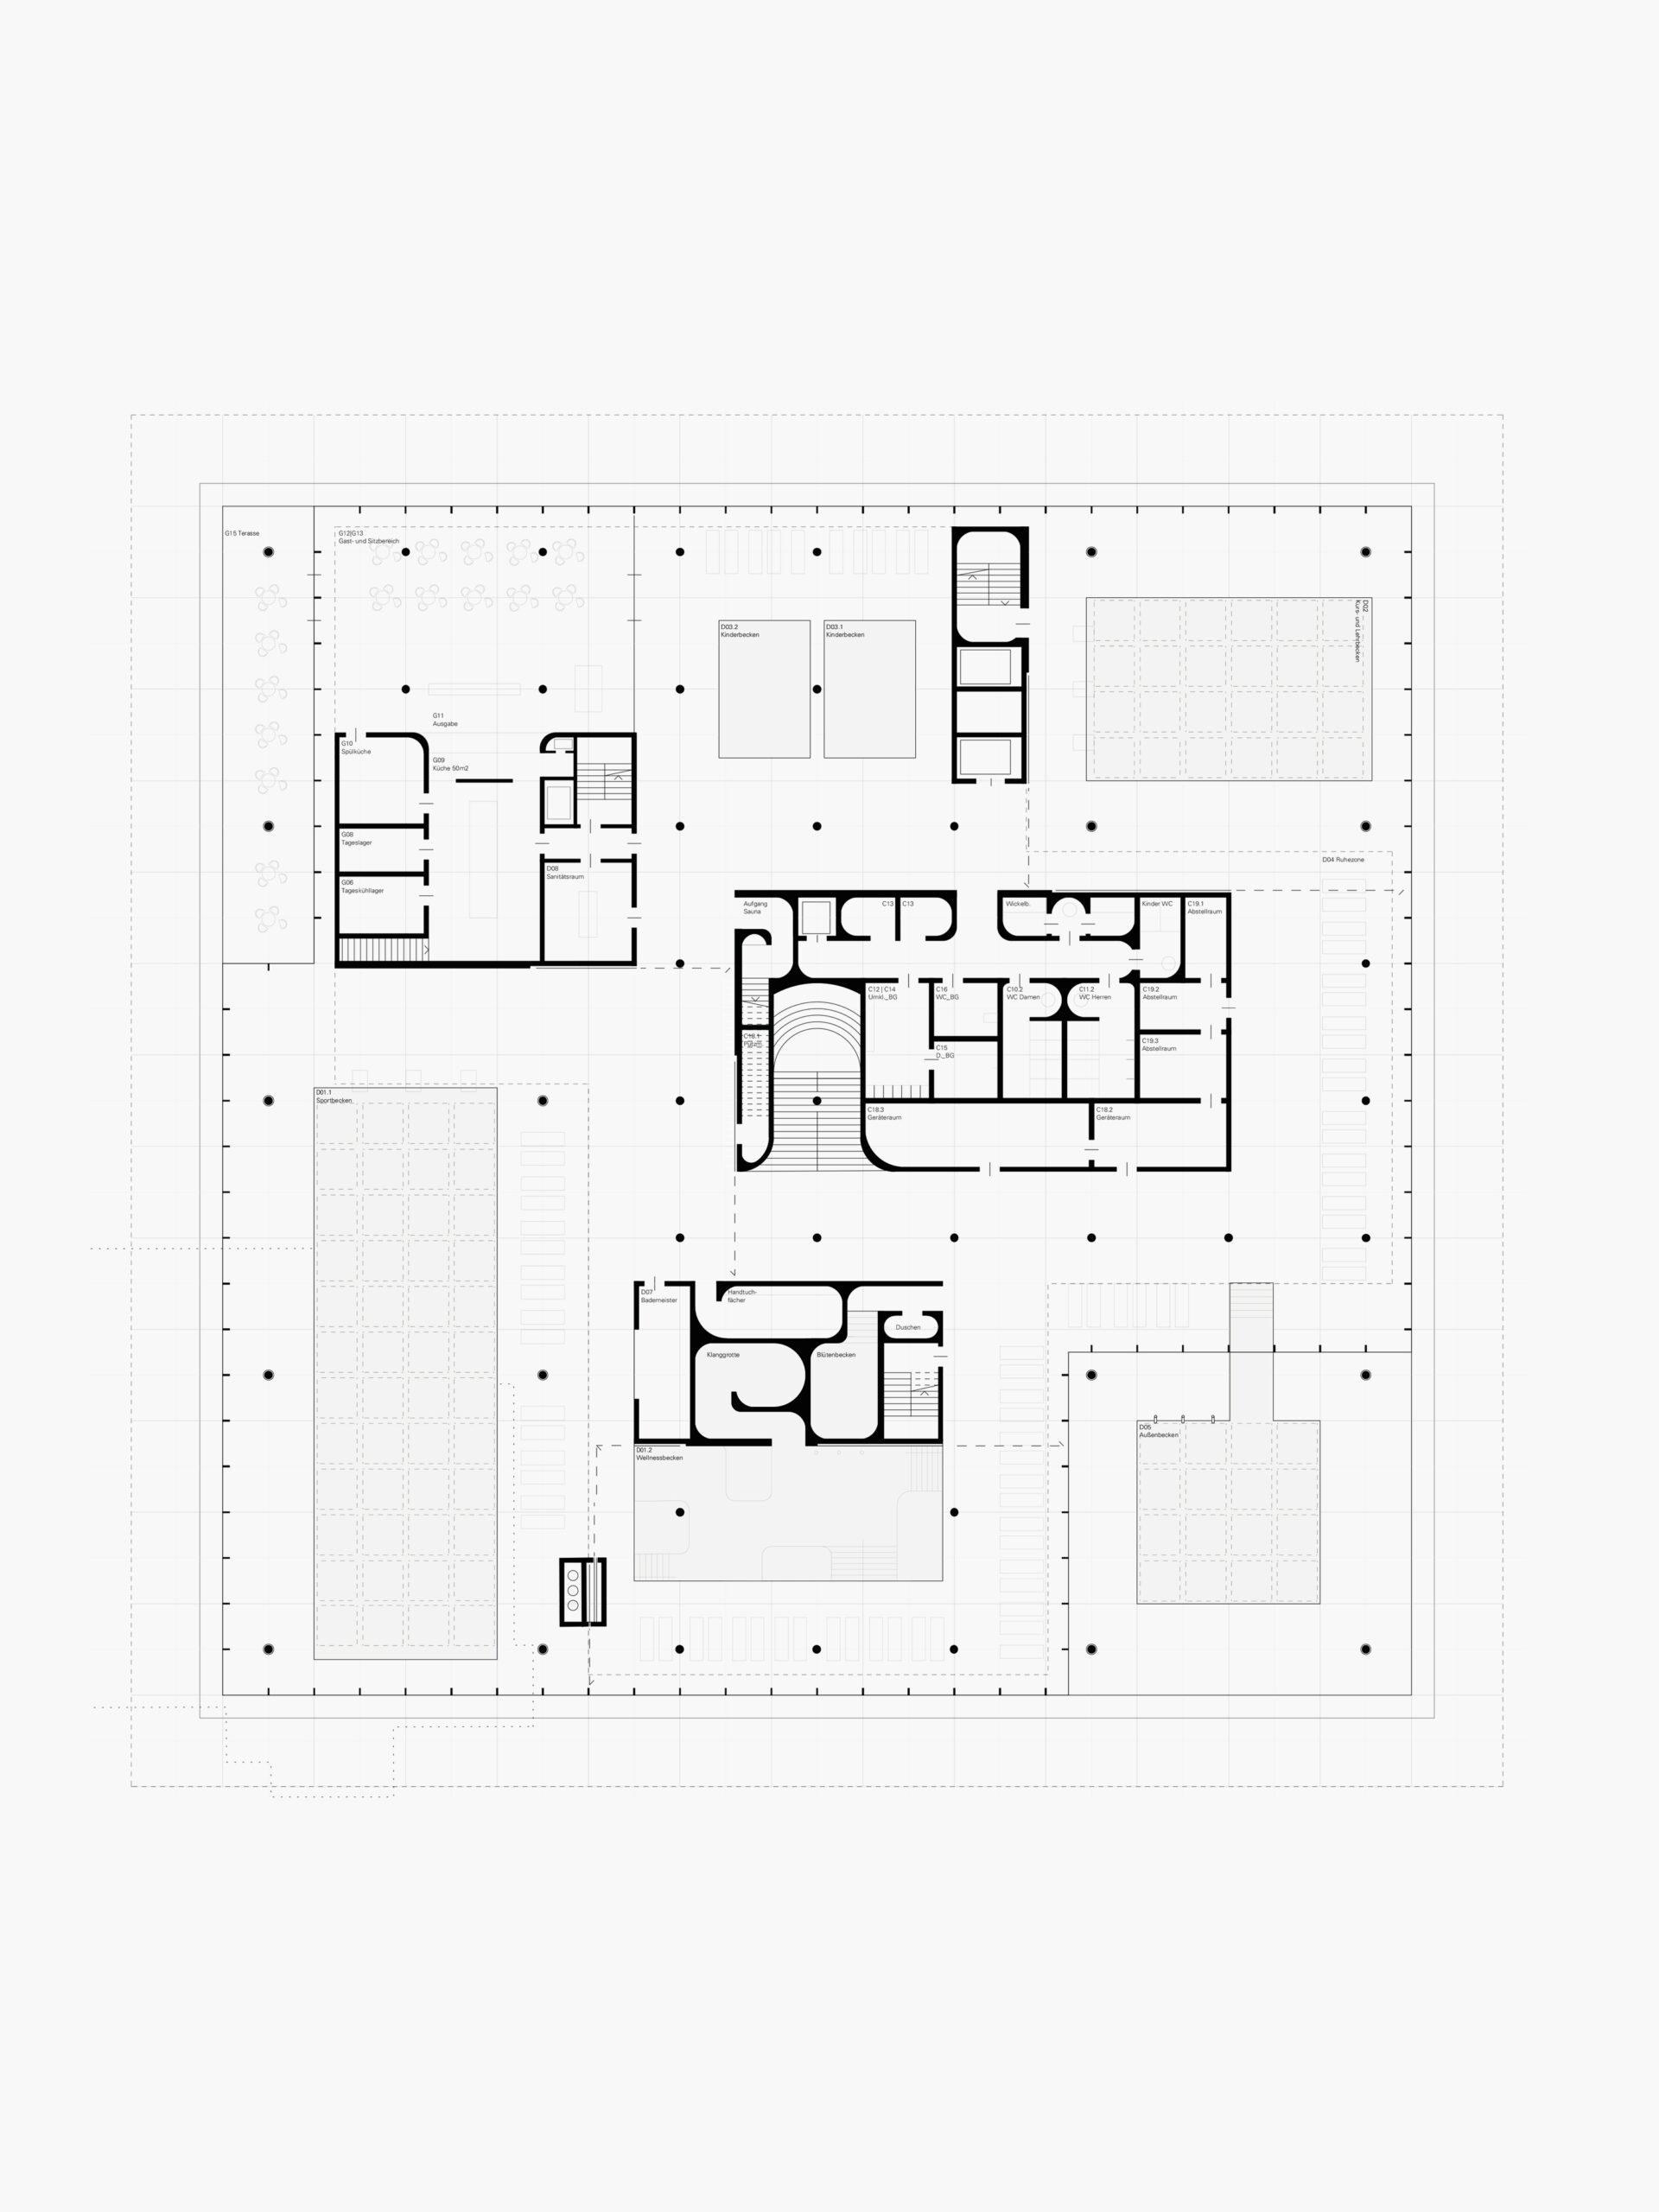 Michael-Becker-Architects-Architekten-Therme-Oberstdorf-Grundriss-EG